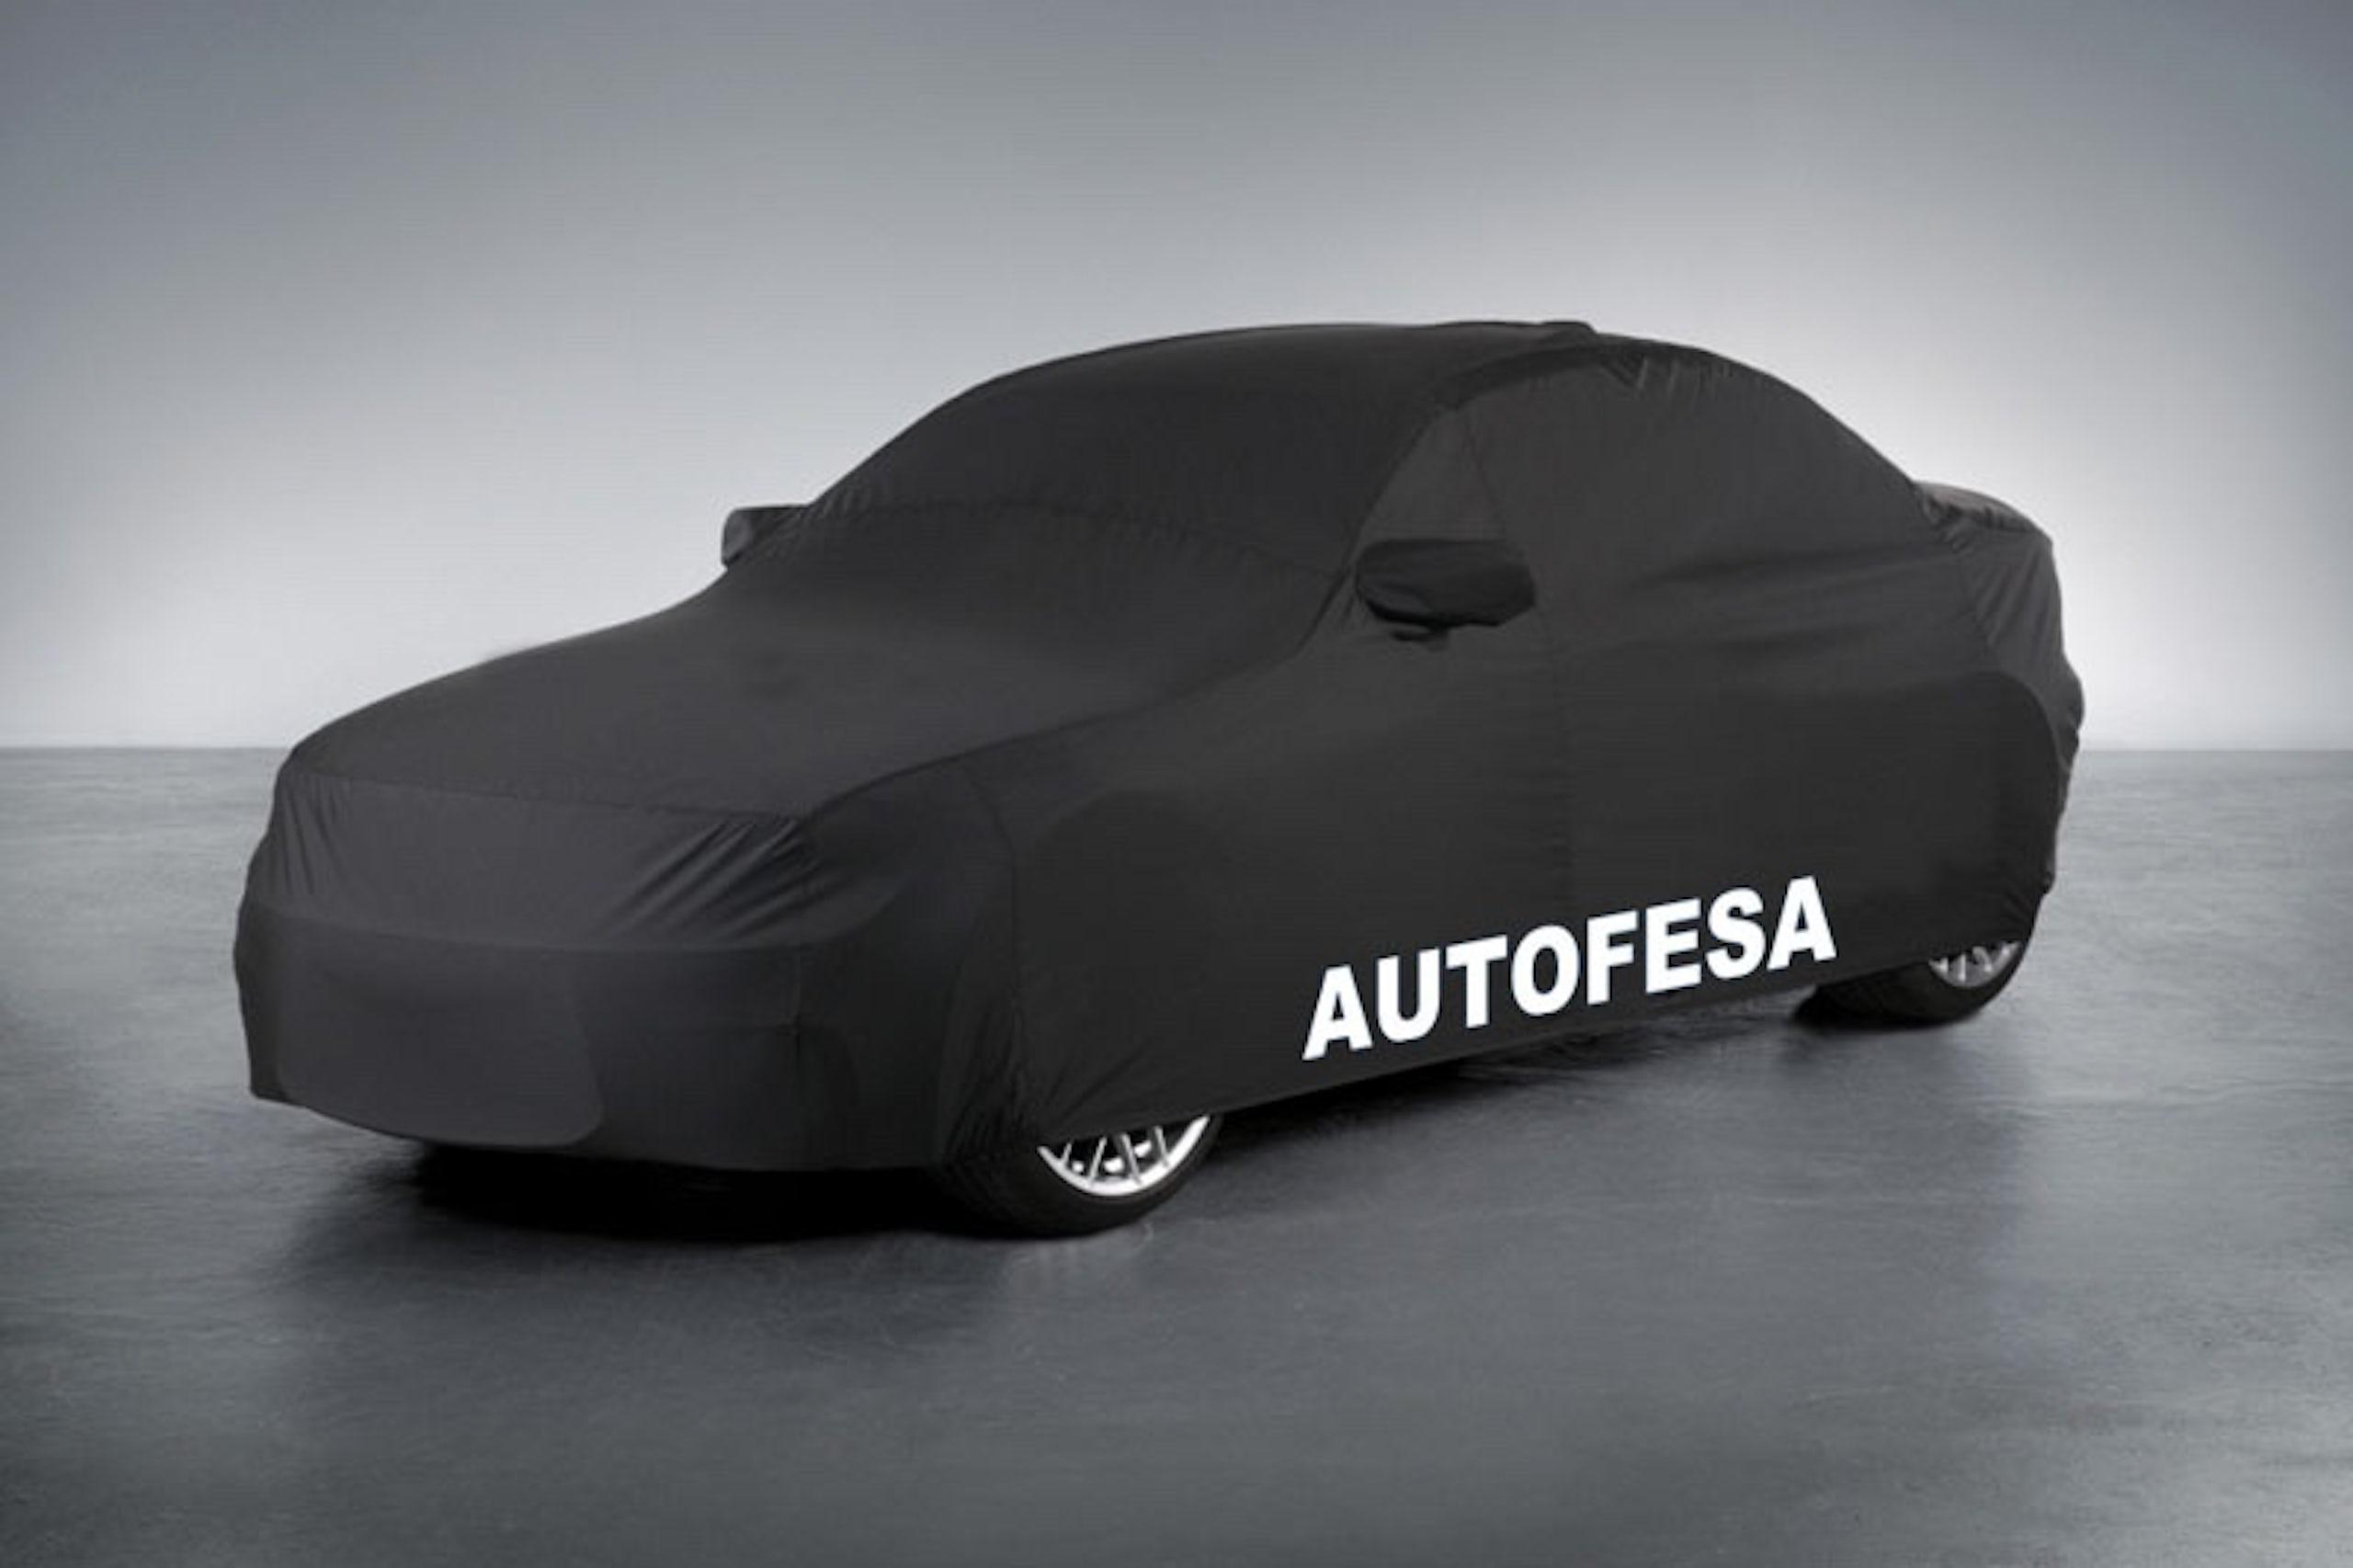 Mitsubishi Outlander 2.0 DI-D 150cv Motion 2WD 5p 7plz Auto S/S - Foto 1